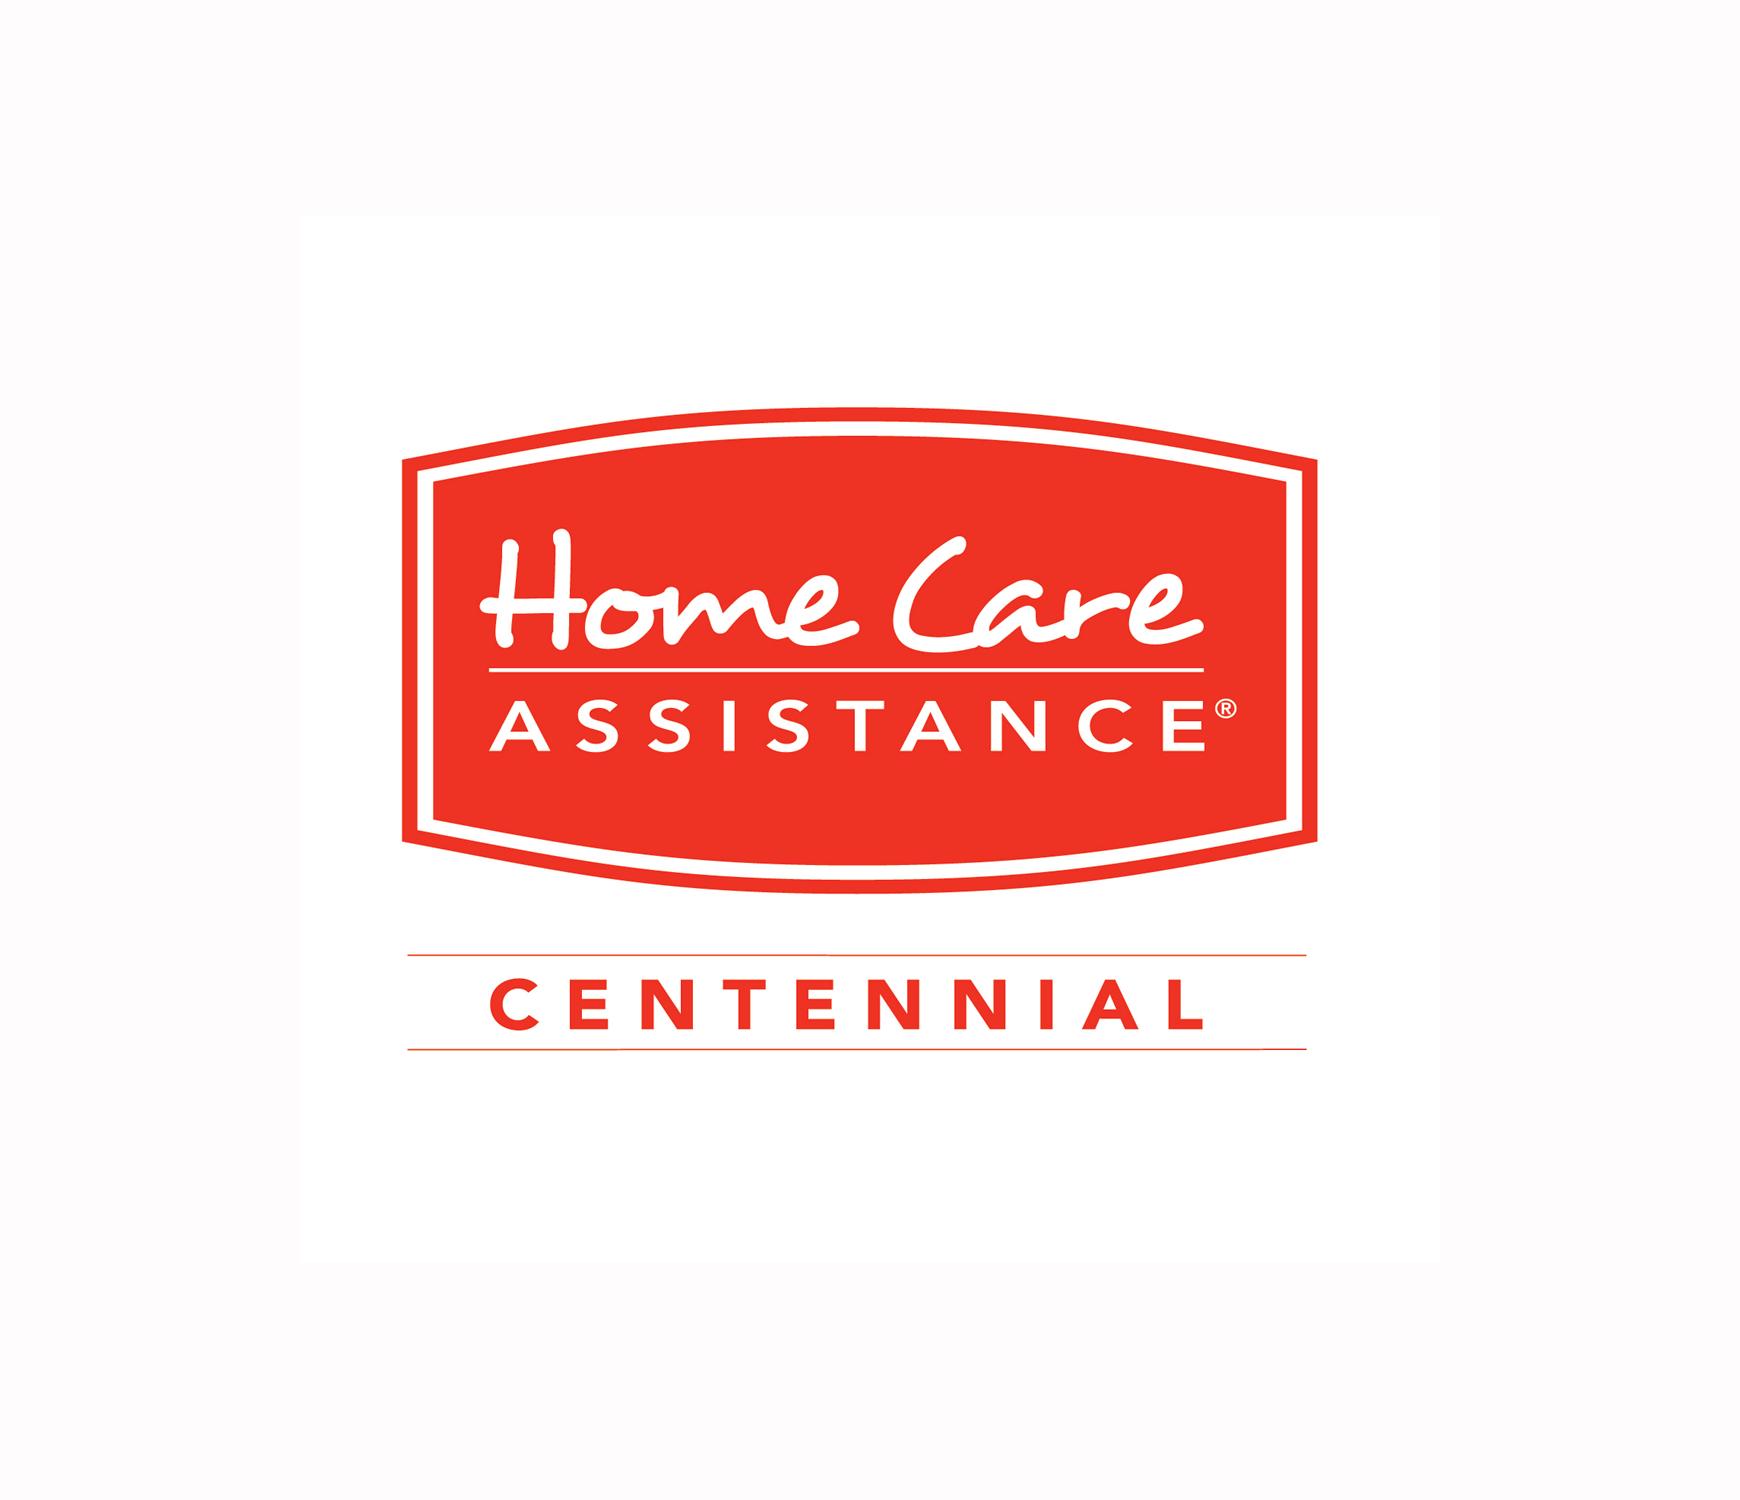 Home Care Assistance of Centennial